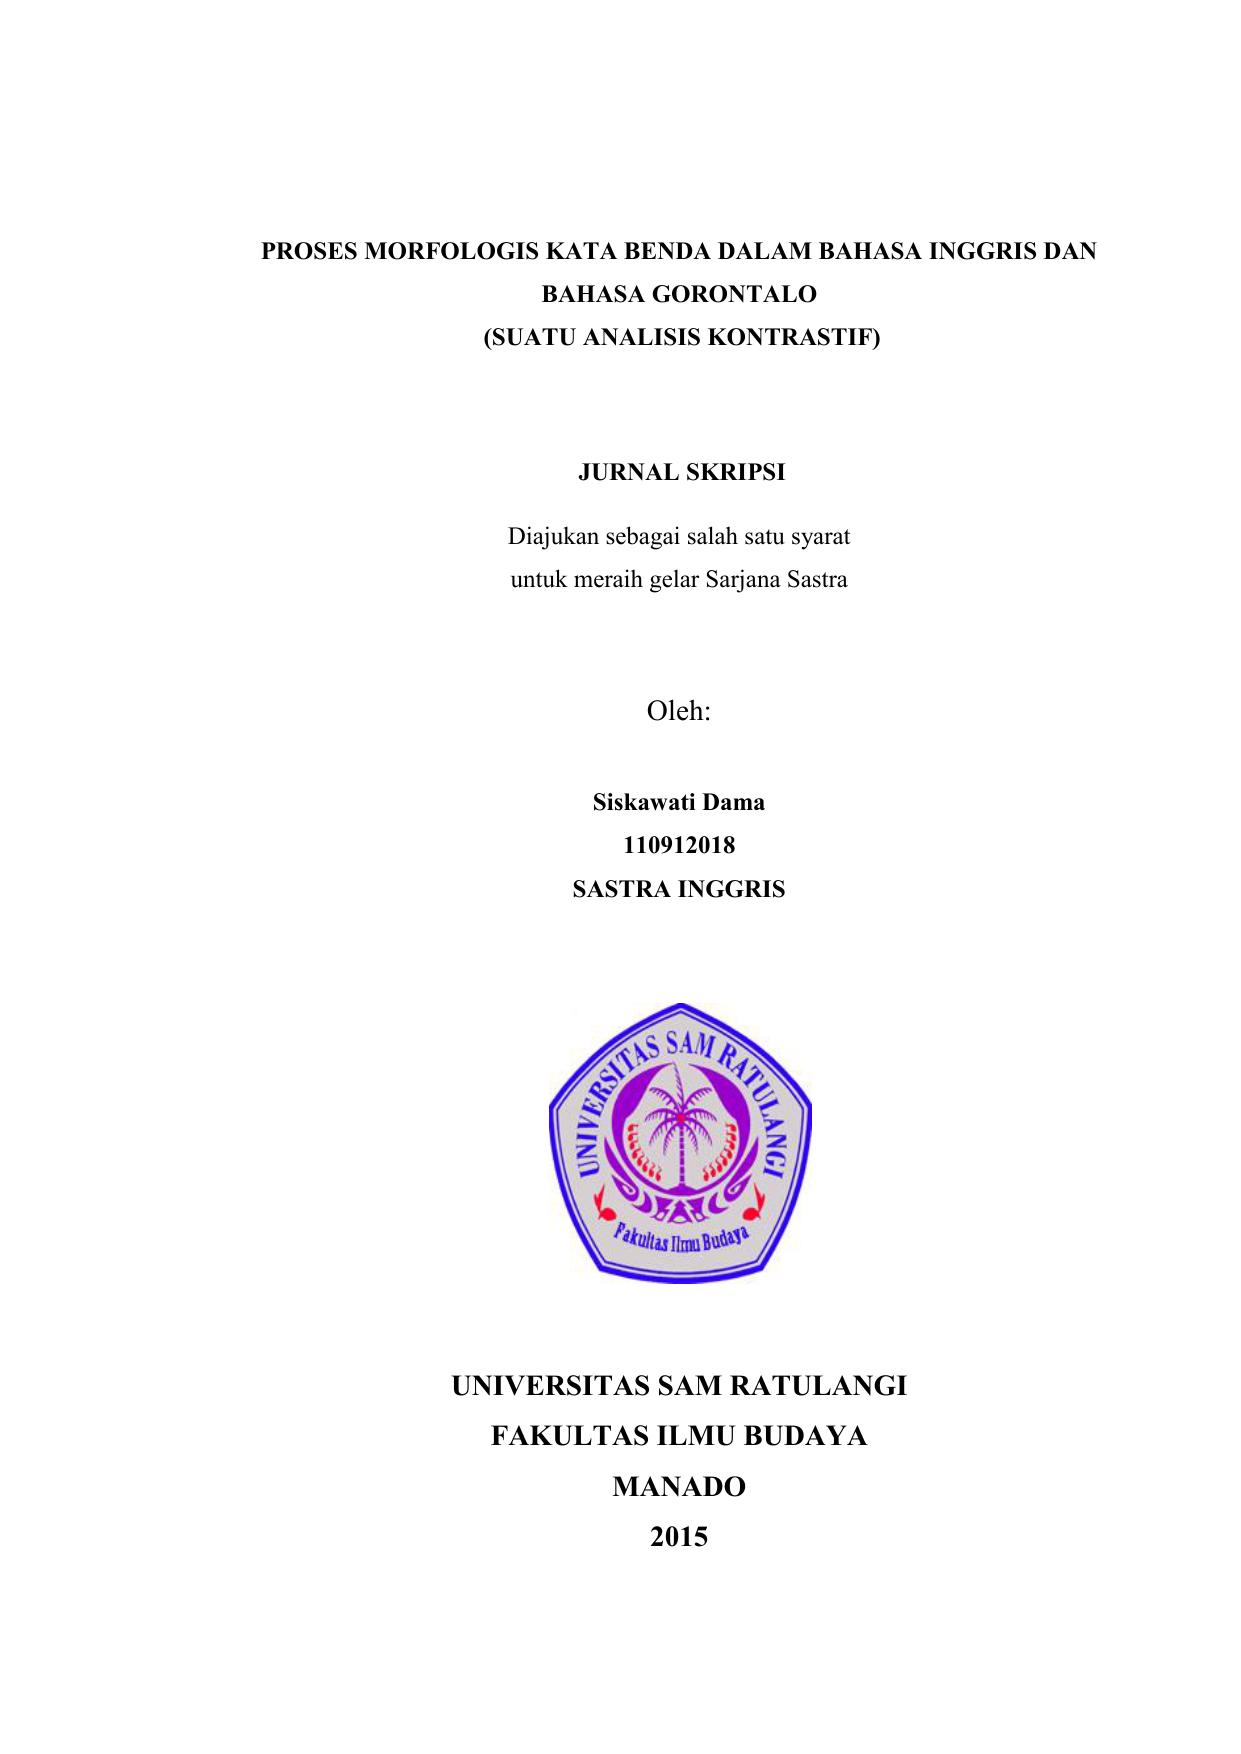 Oleh Universitas Sam Ratulangi Fakultas Ilmu Budaya